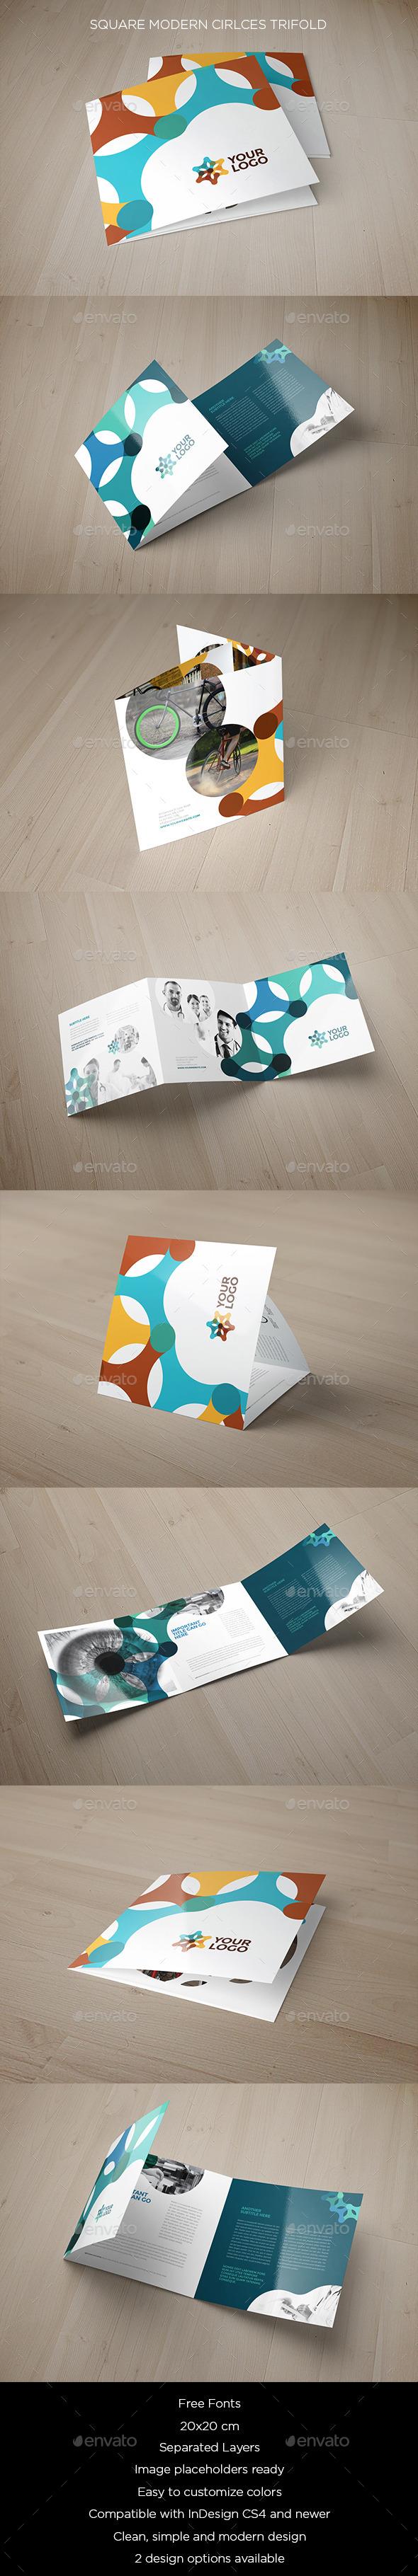 Square Modern Circles Trifold - Brochures Print Templates